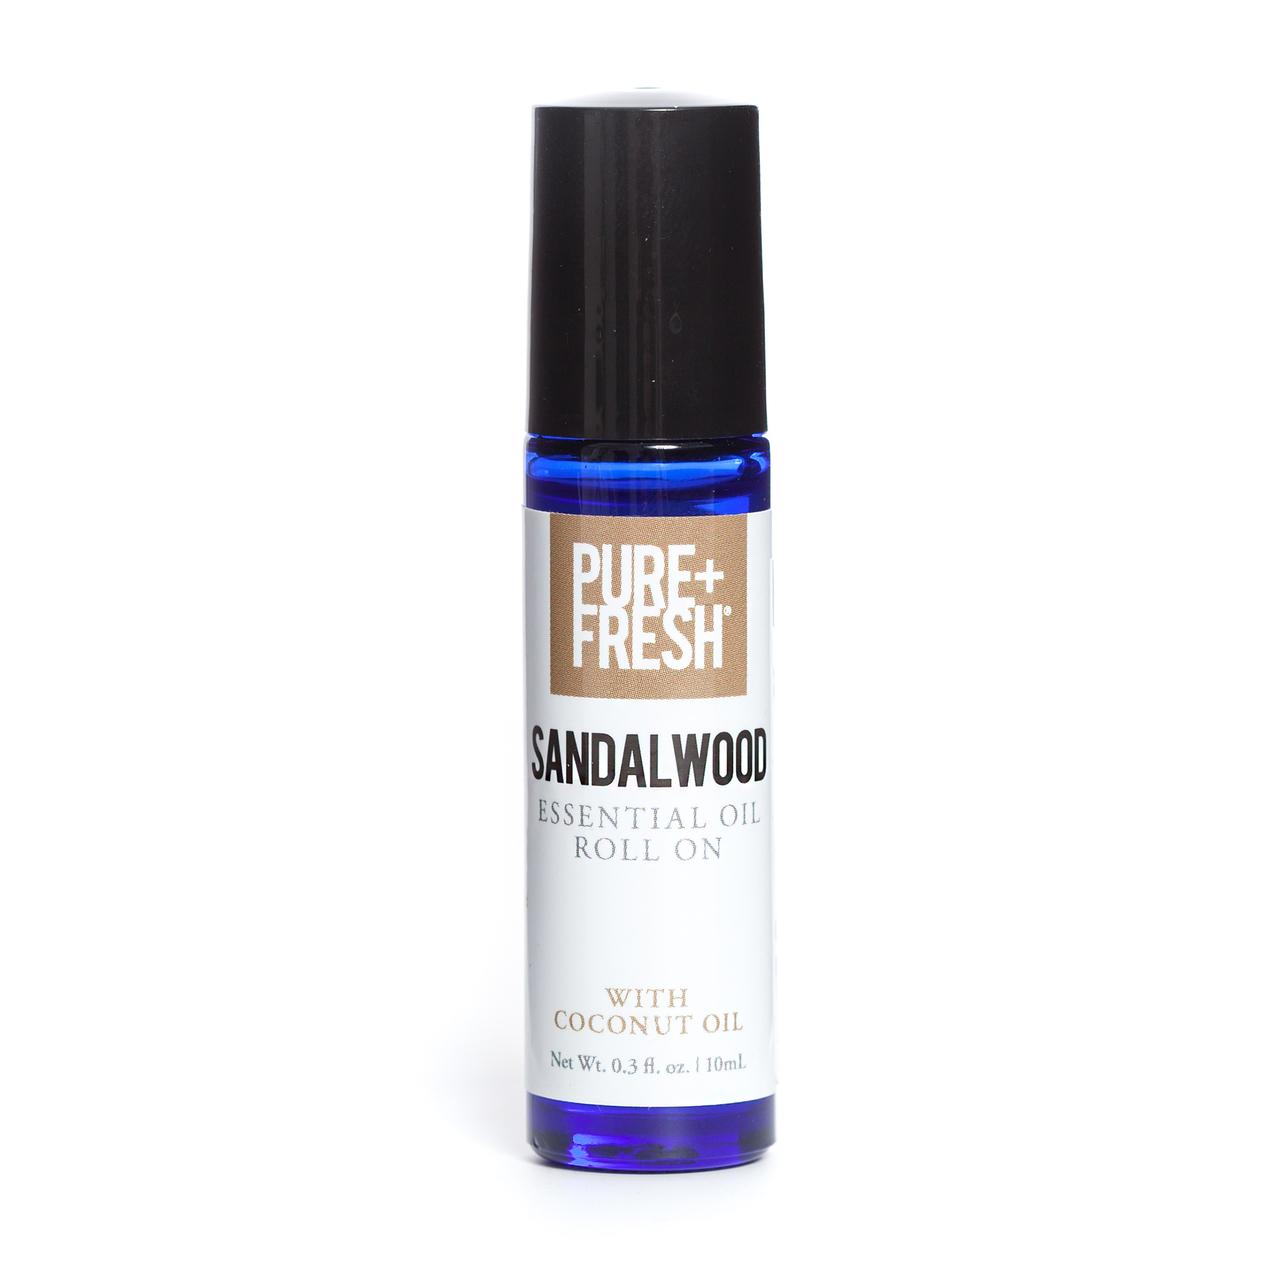 0.3 fl oz. Bottle of Pure+Fresh Sandalwood Roll On Essential Oil